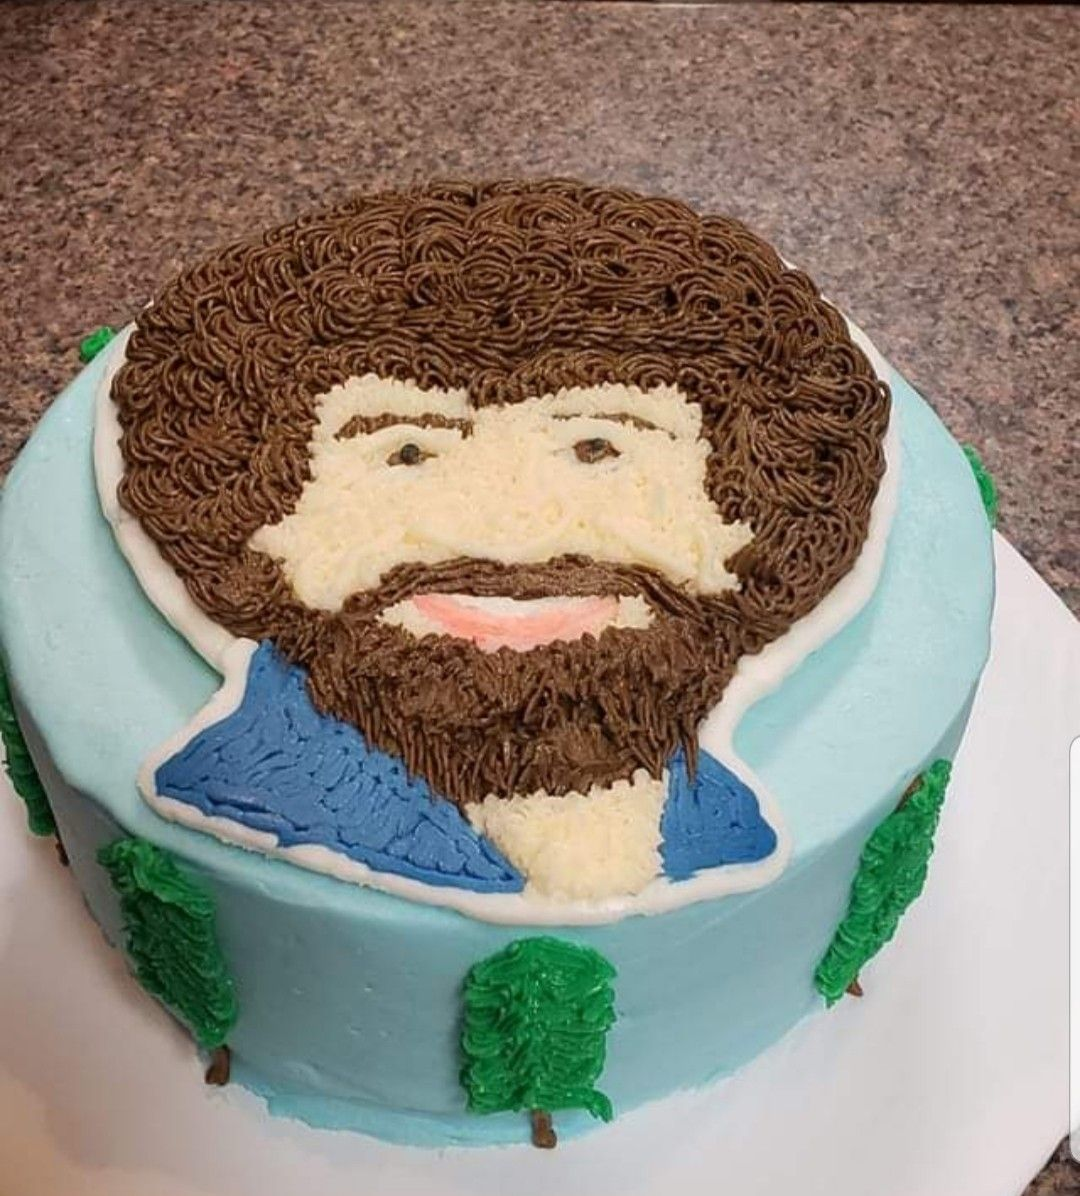 Bob Ross cake in 2020 Bob ross birthday, Cake decorating